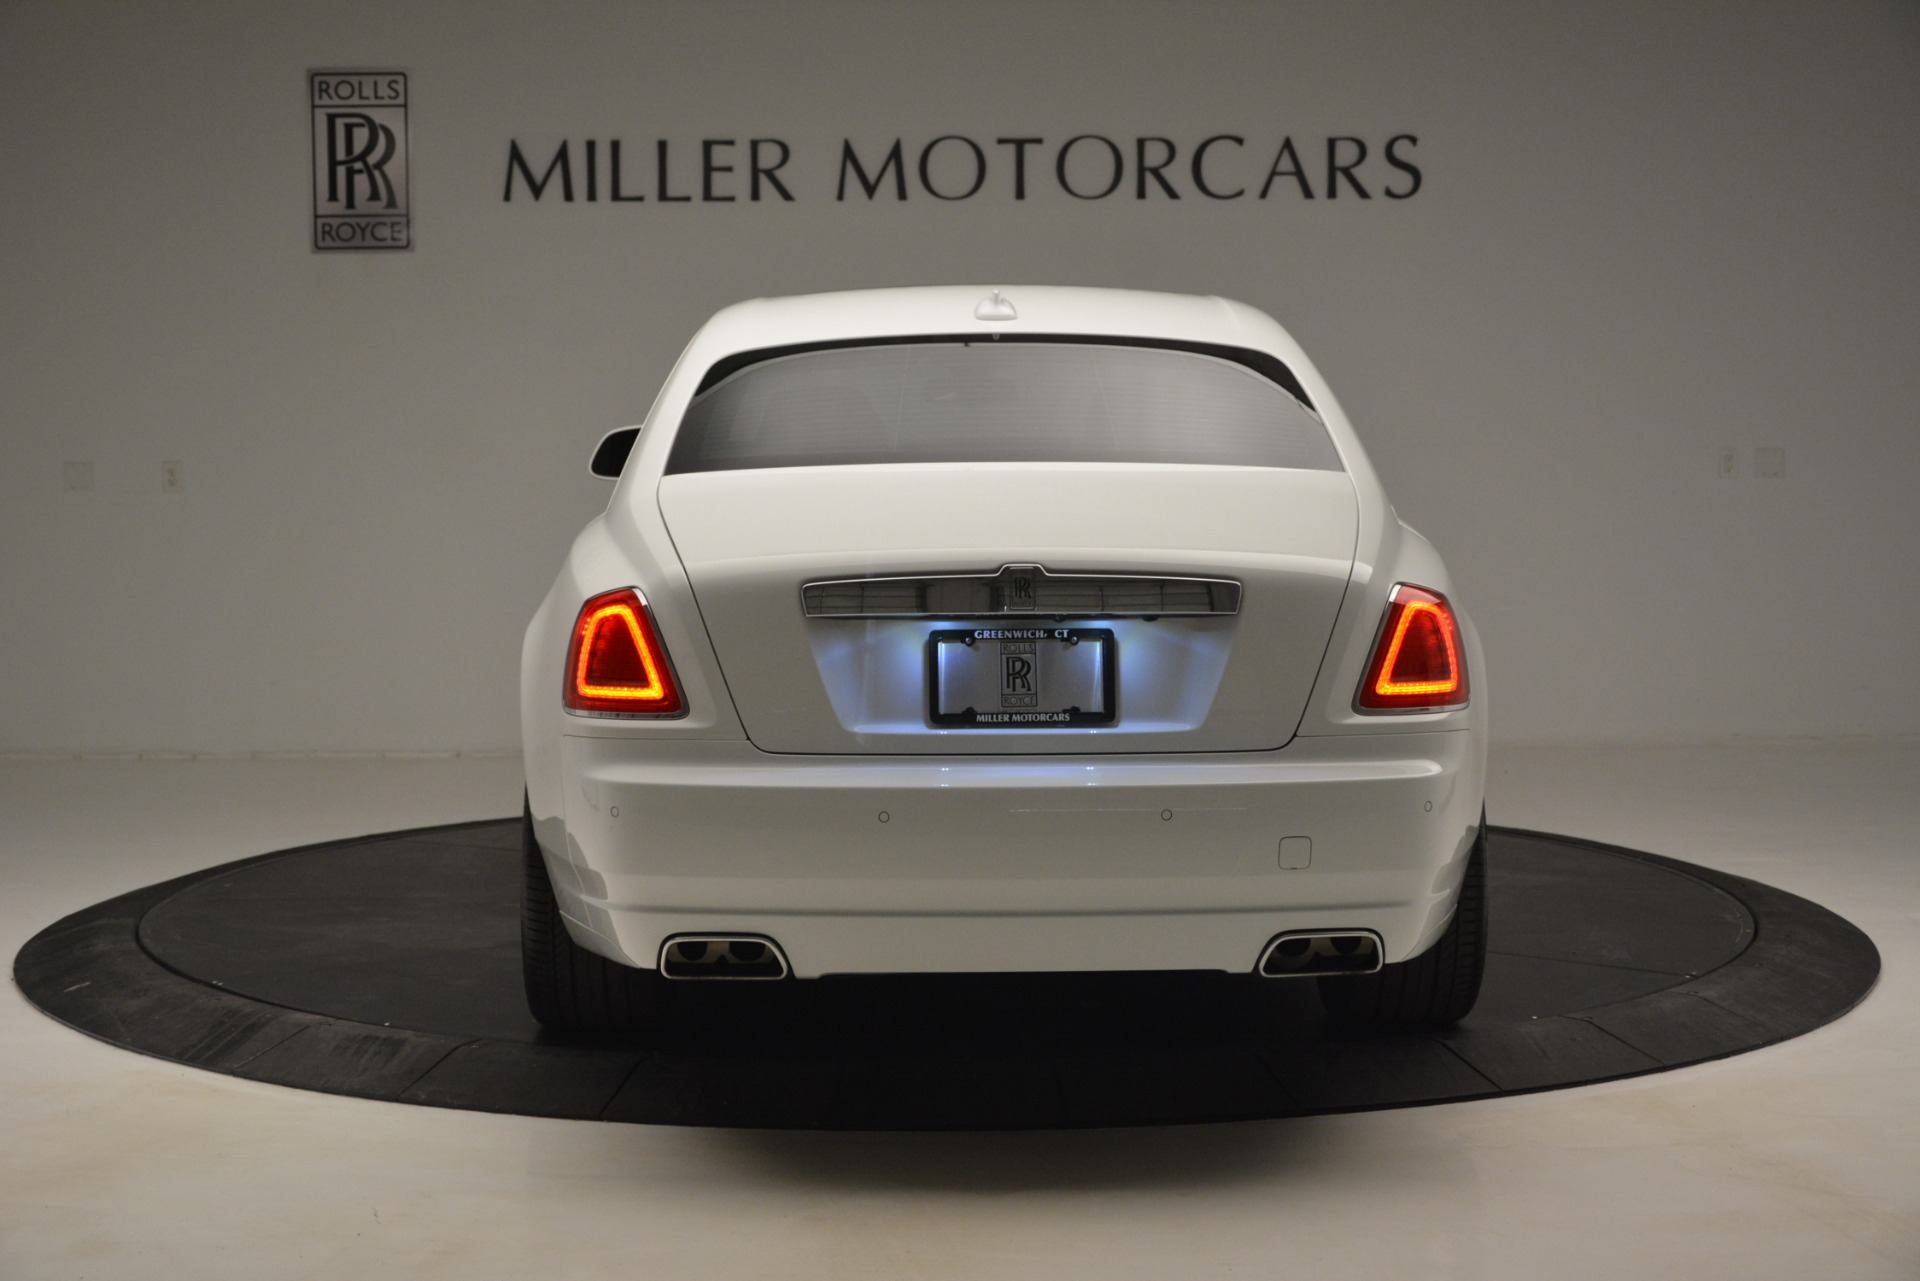 Used 2014 Rolls-Royce Ghost V-Spec For Sale In Westport, CT 2989_p7